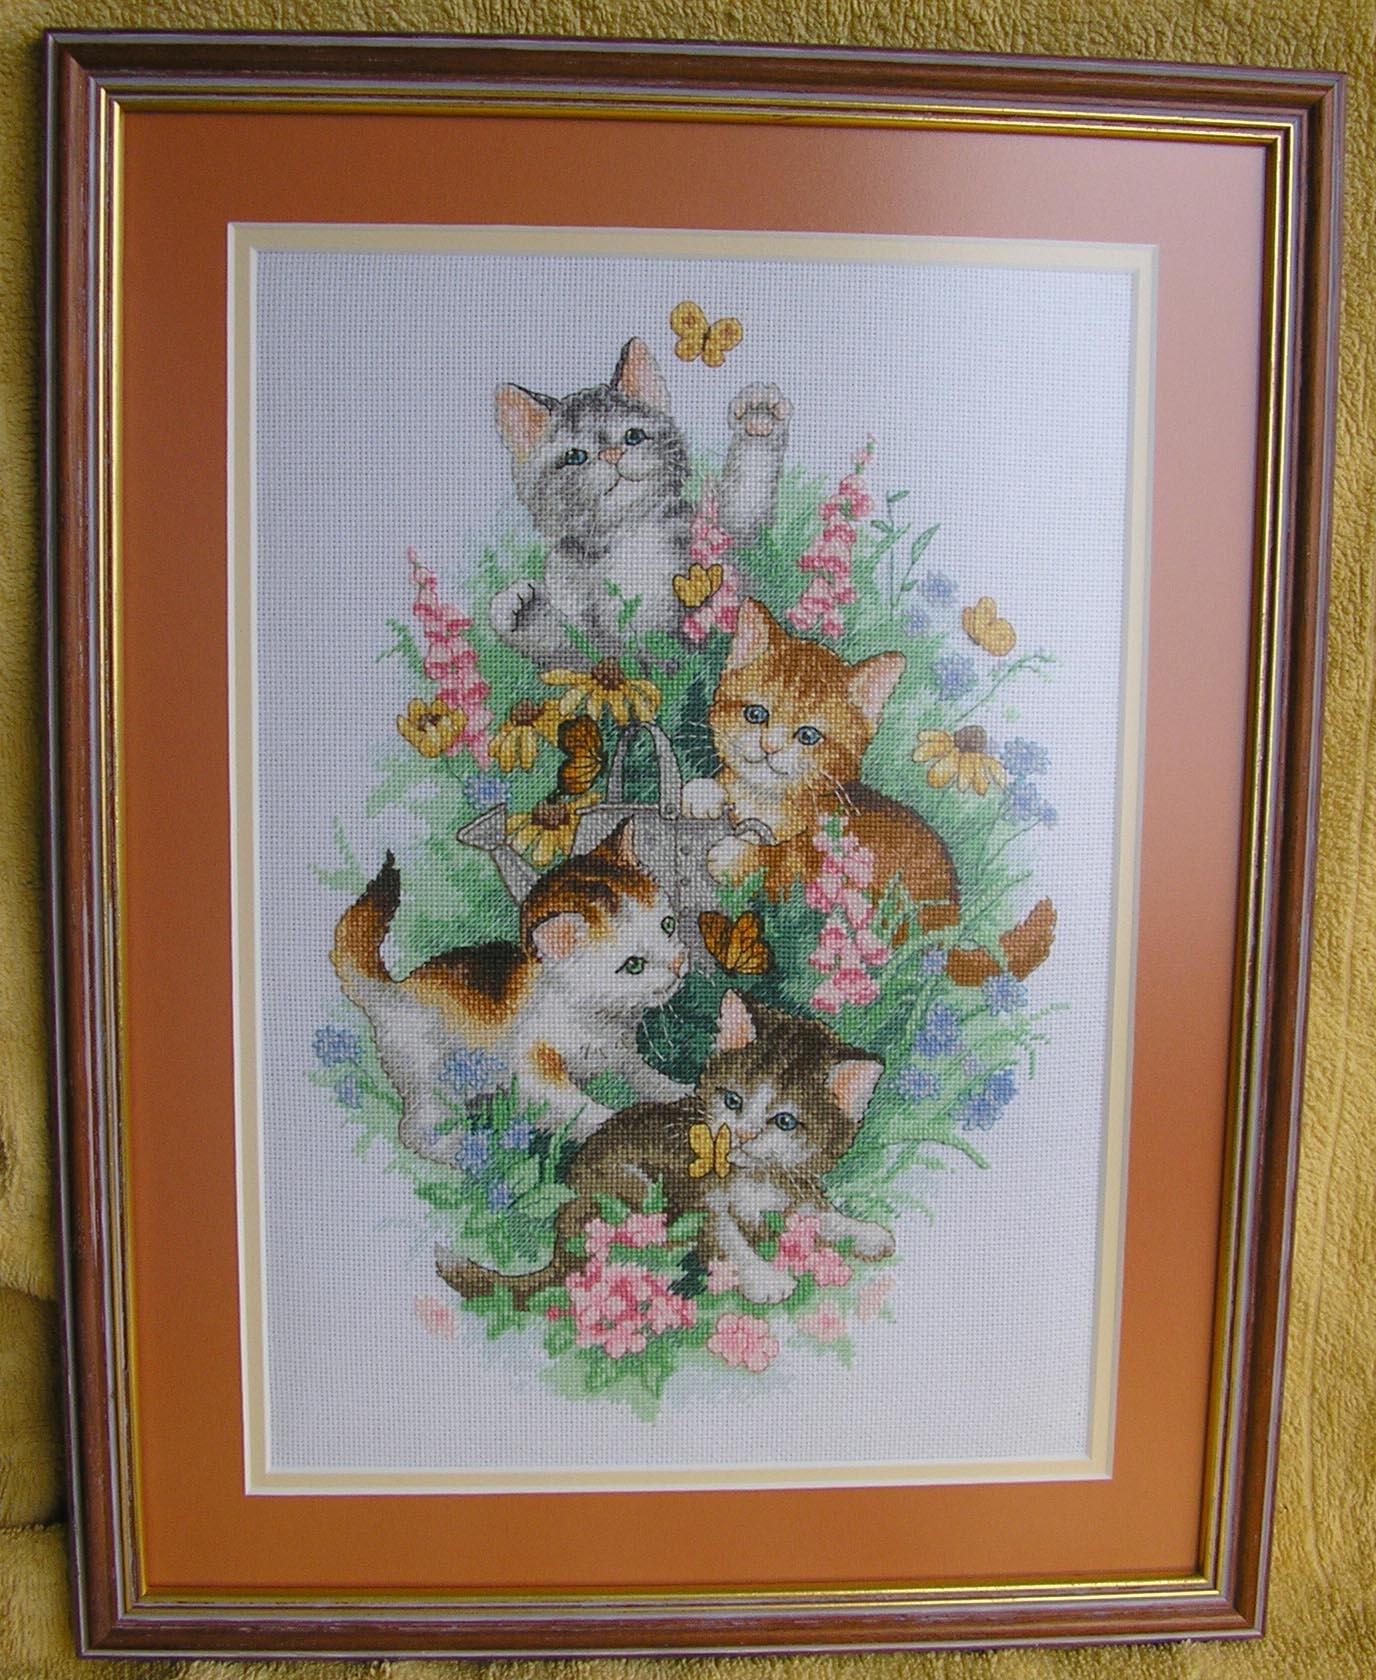 'Playful kitties' набор Dimensions . Детские сюжеты